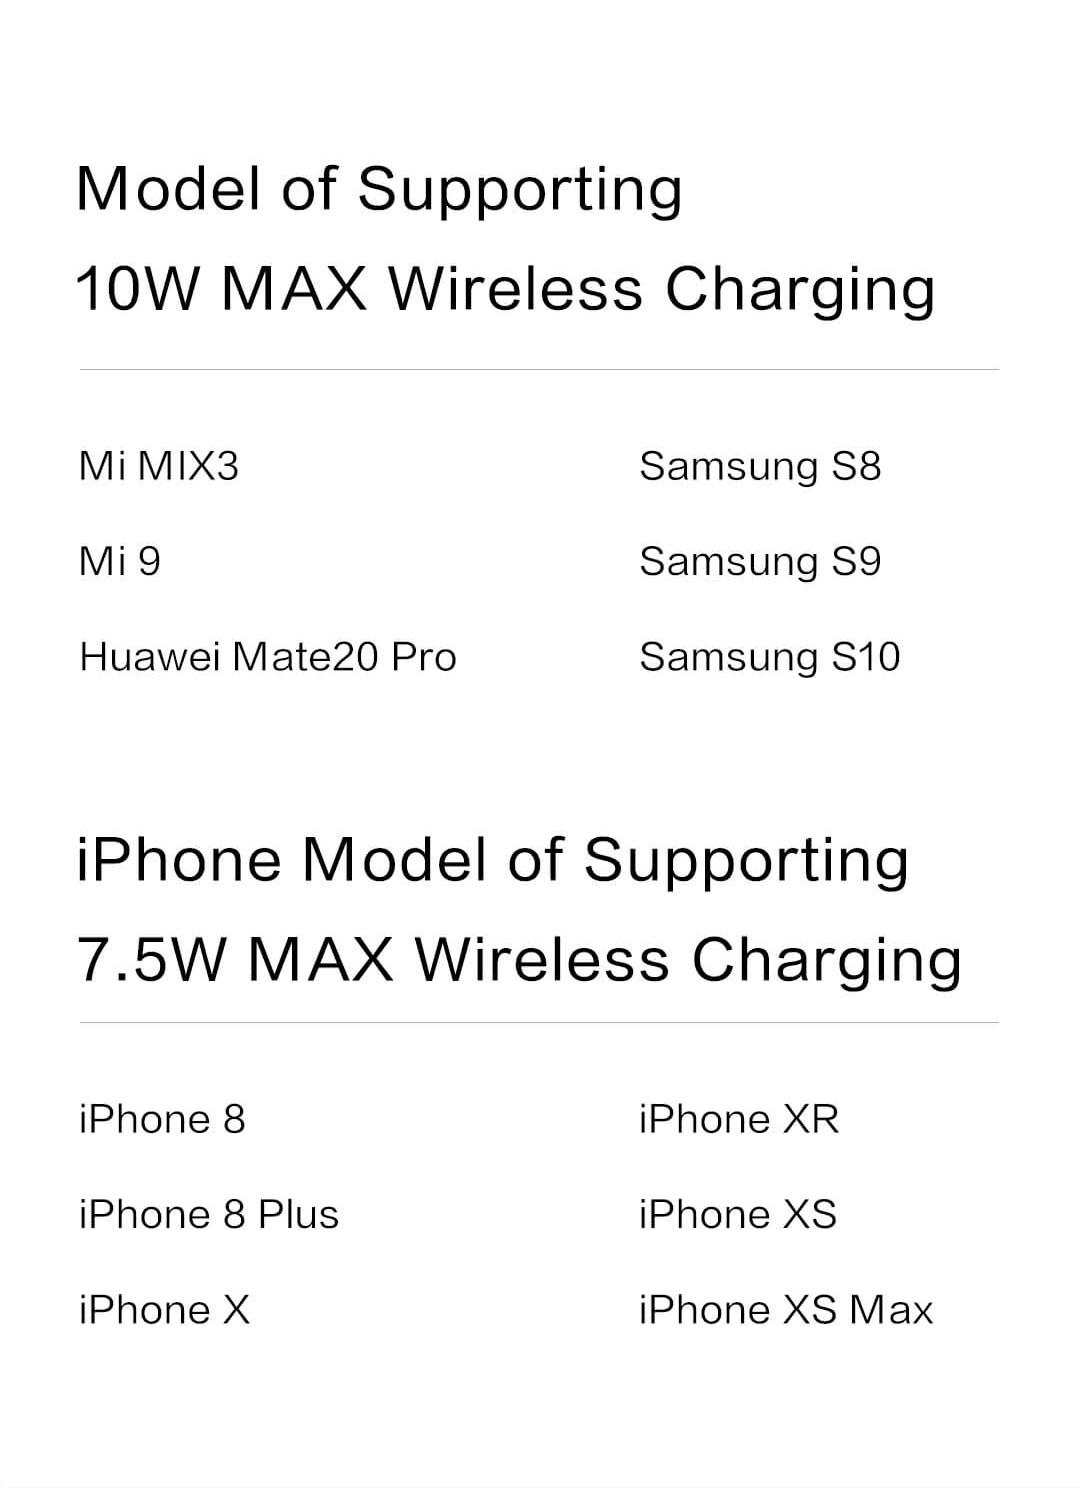 ZMI LevPower M10 USB-C Power Bank, Qi Certified Wireless Charger, Apple MFi Certified, USB PD, Lightning Port Input